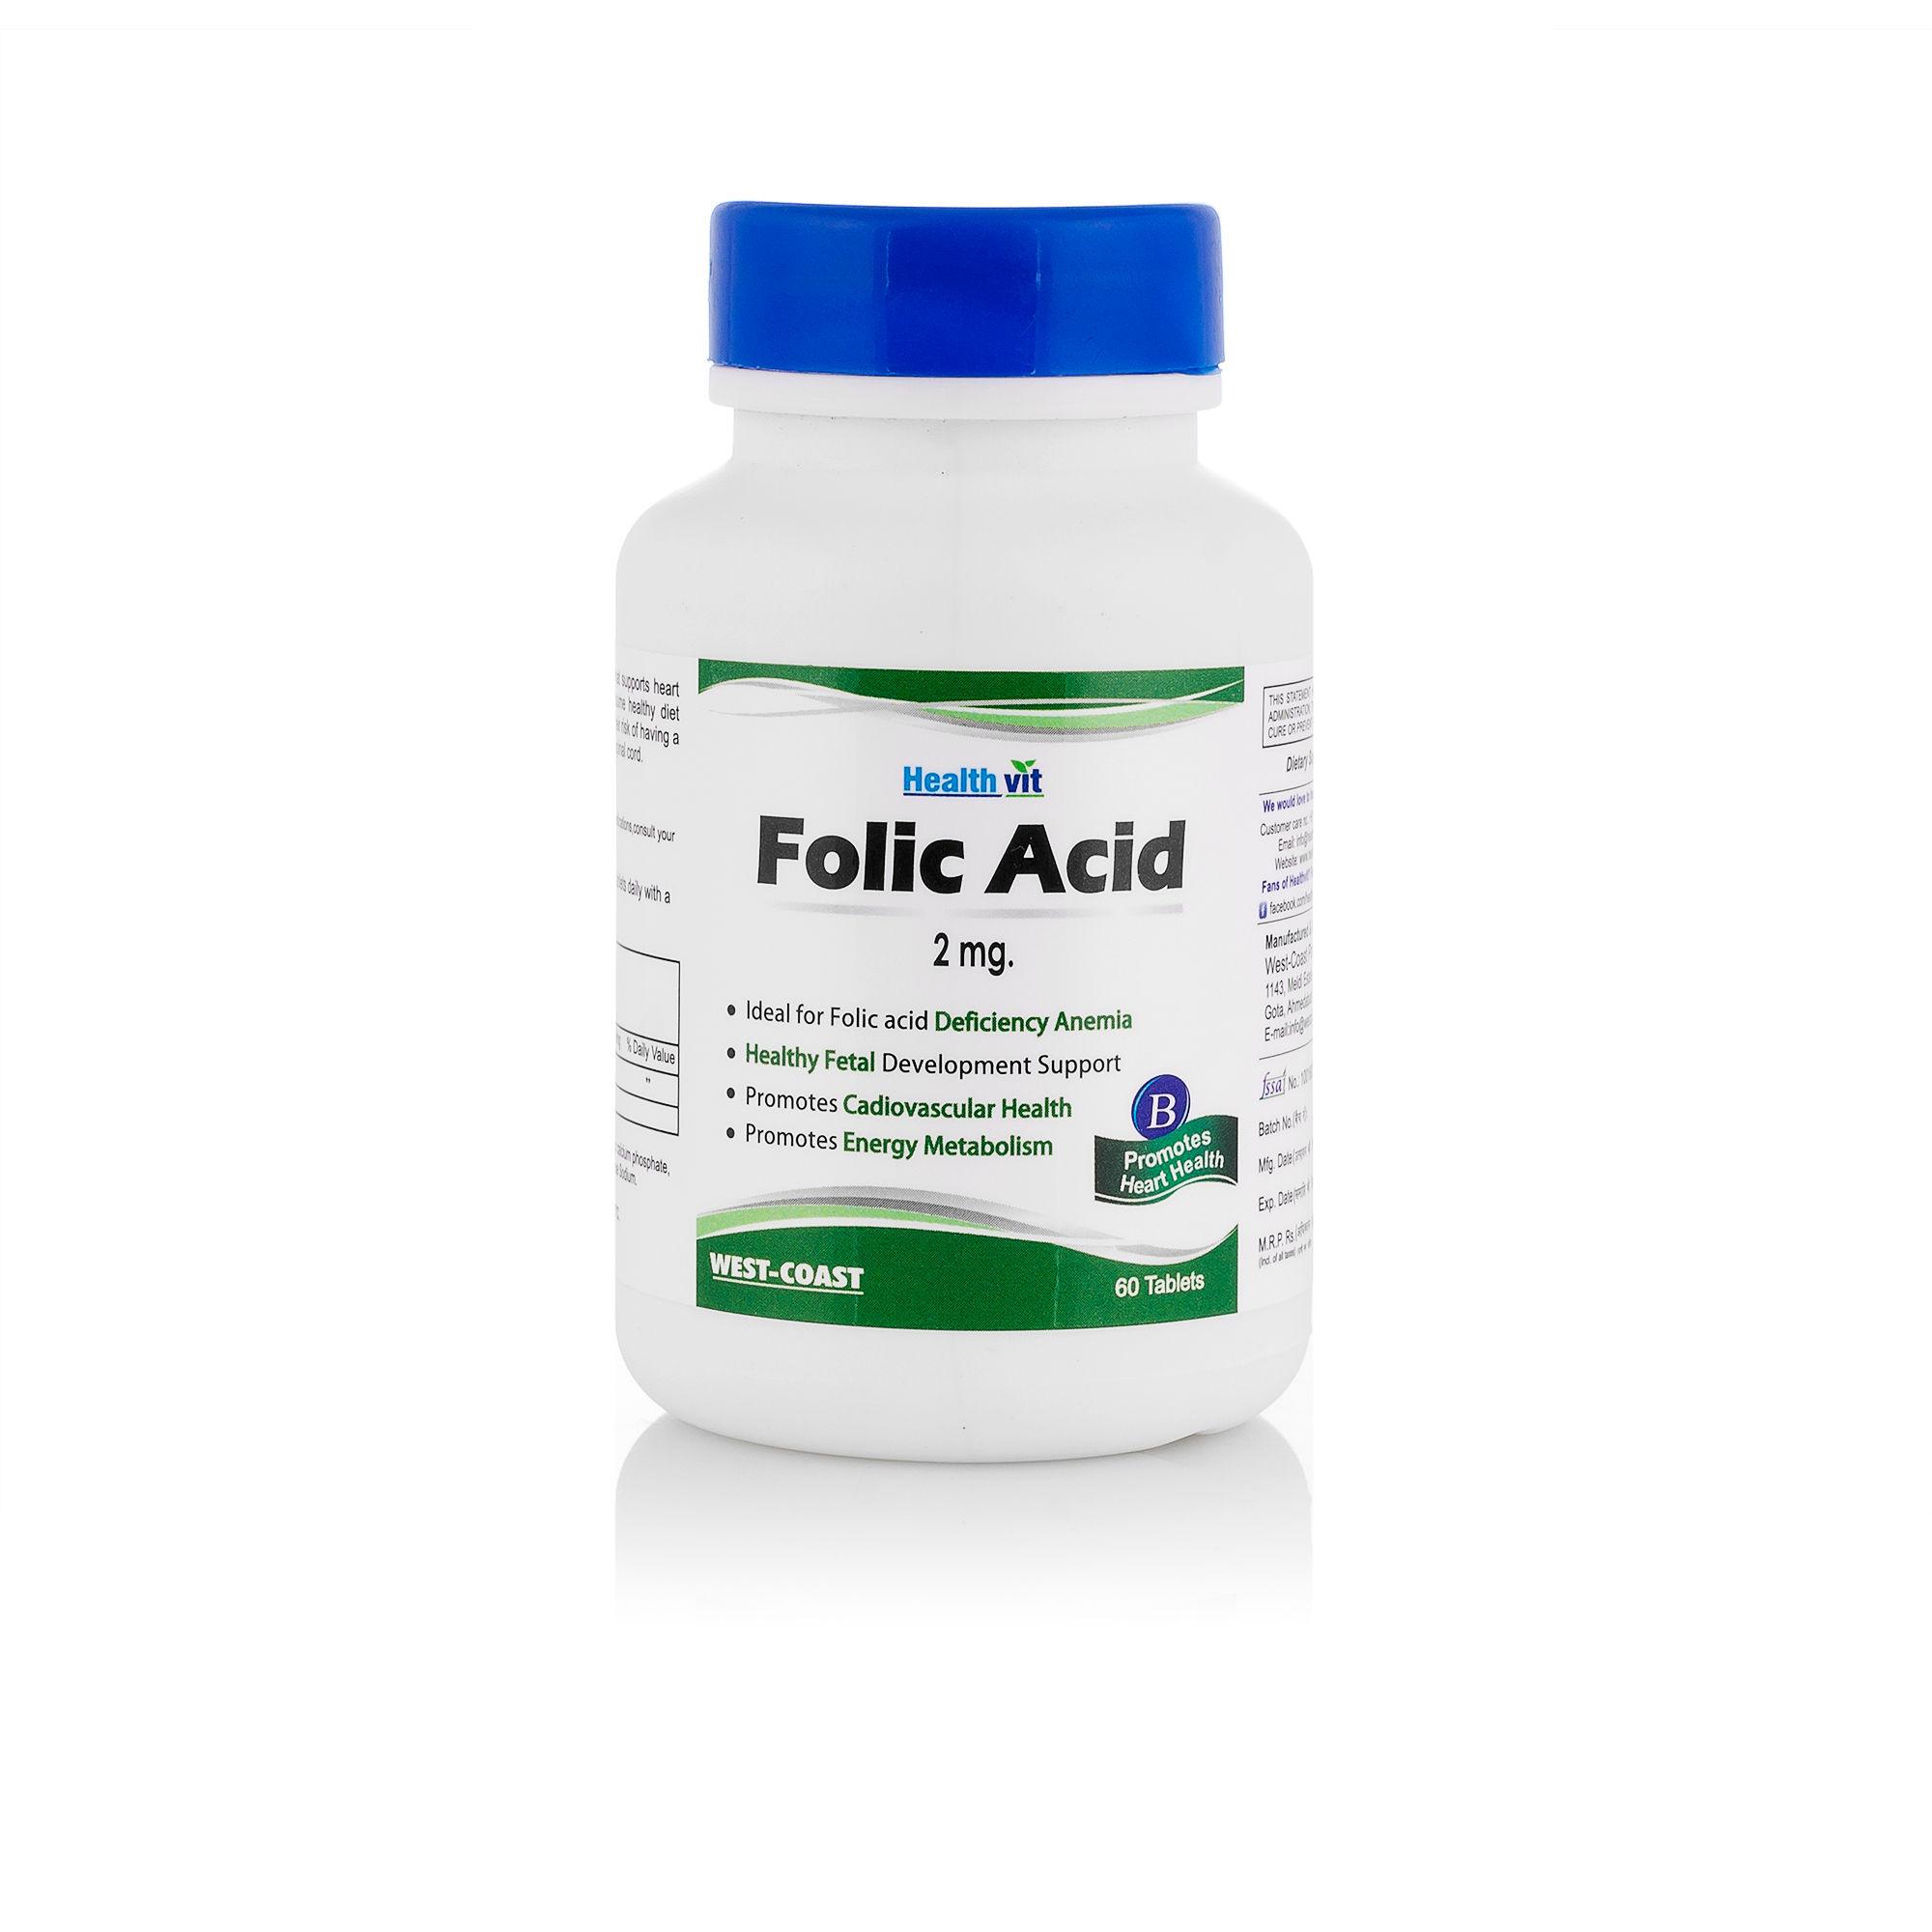 Healthvit Folic Acid 2 mg Supplements (60 Capsules)